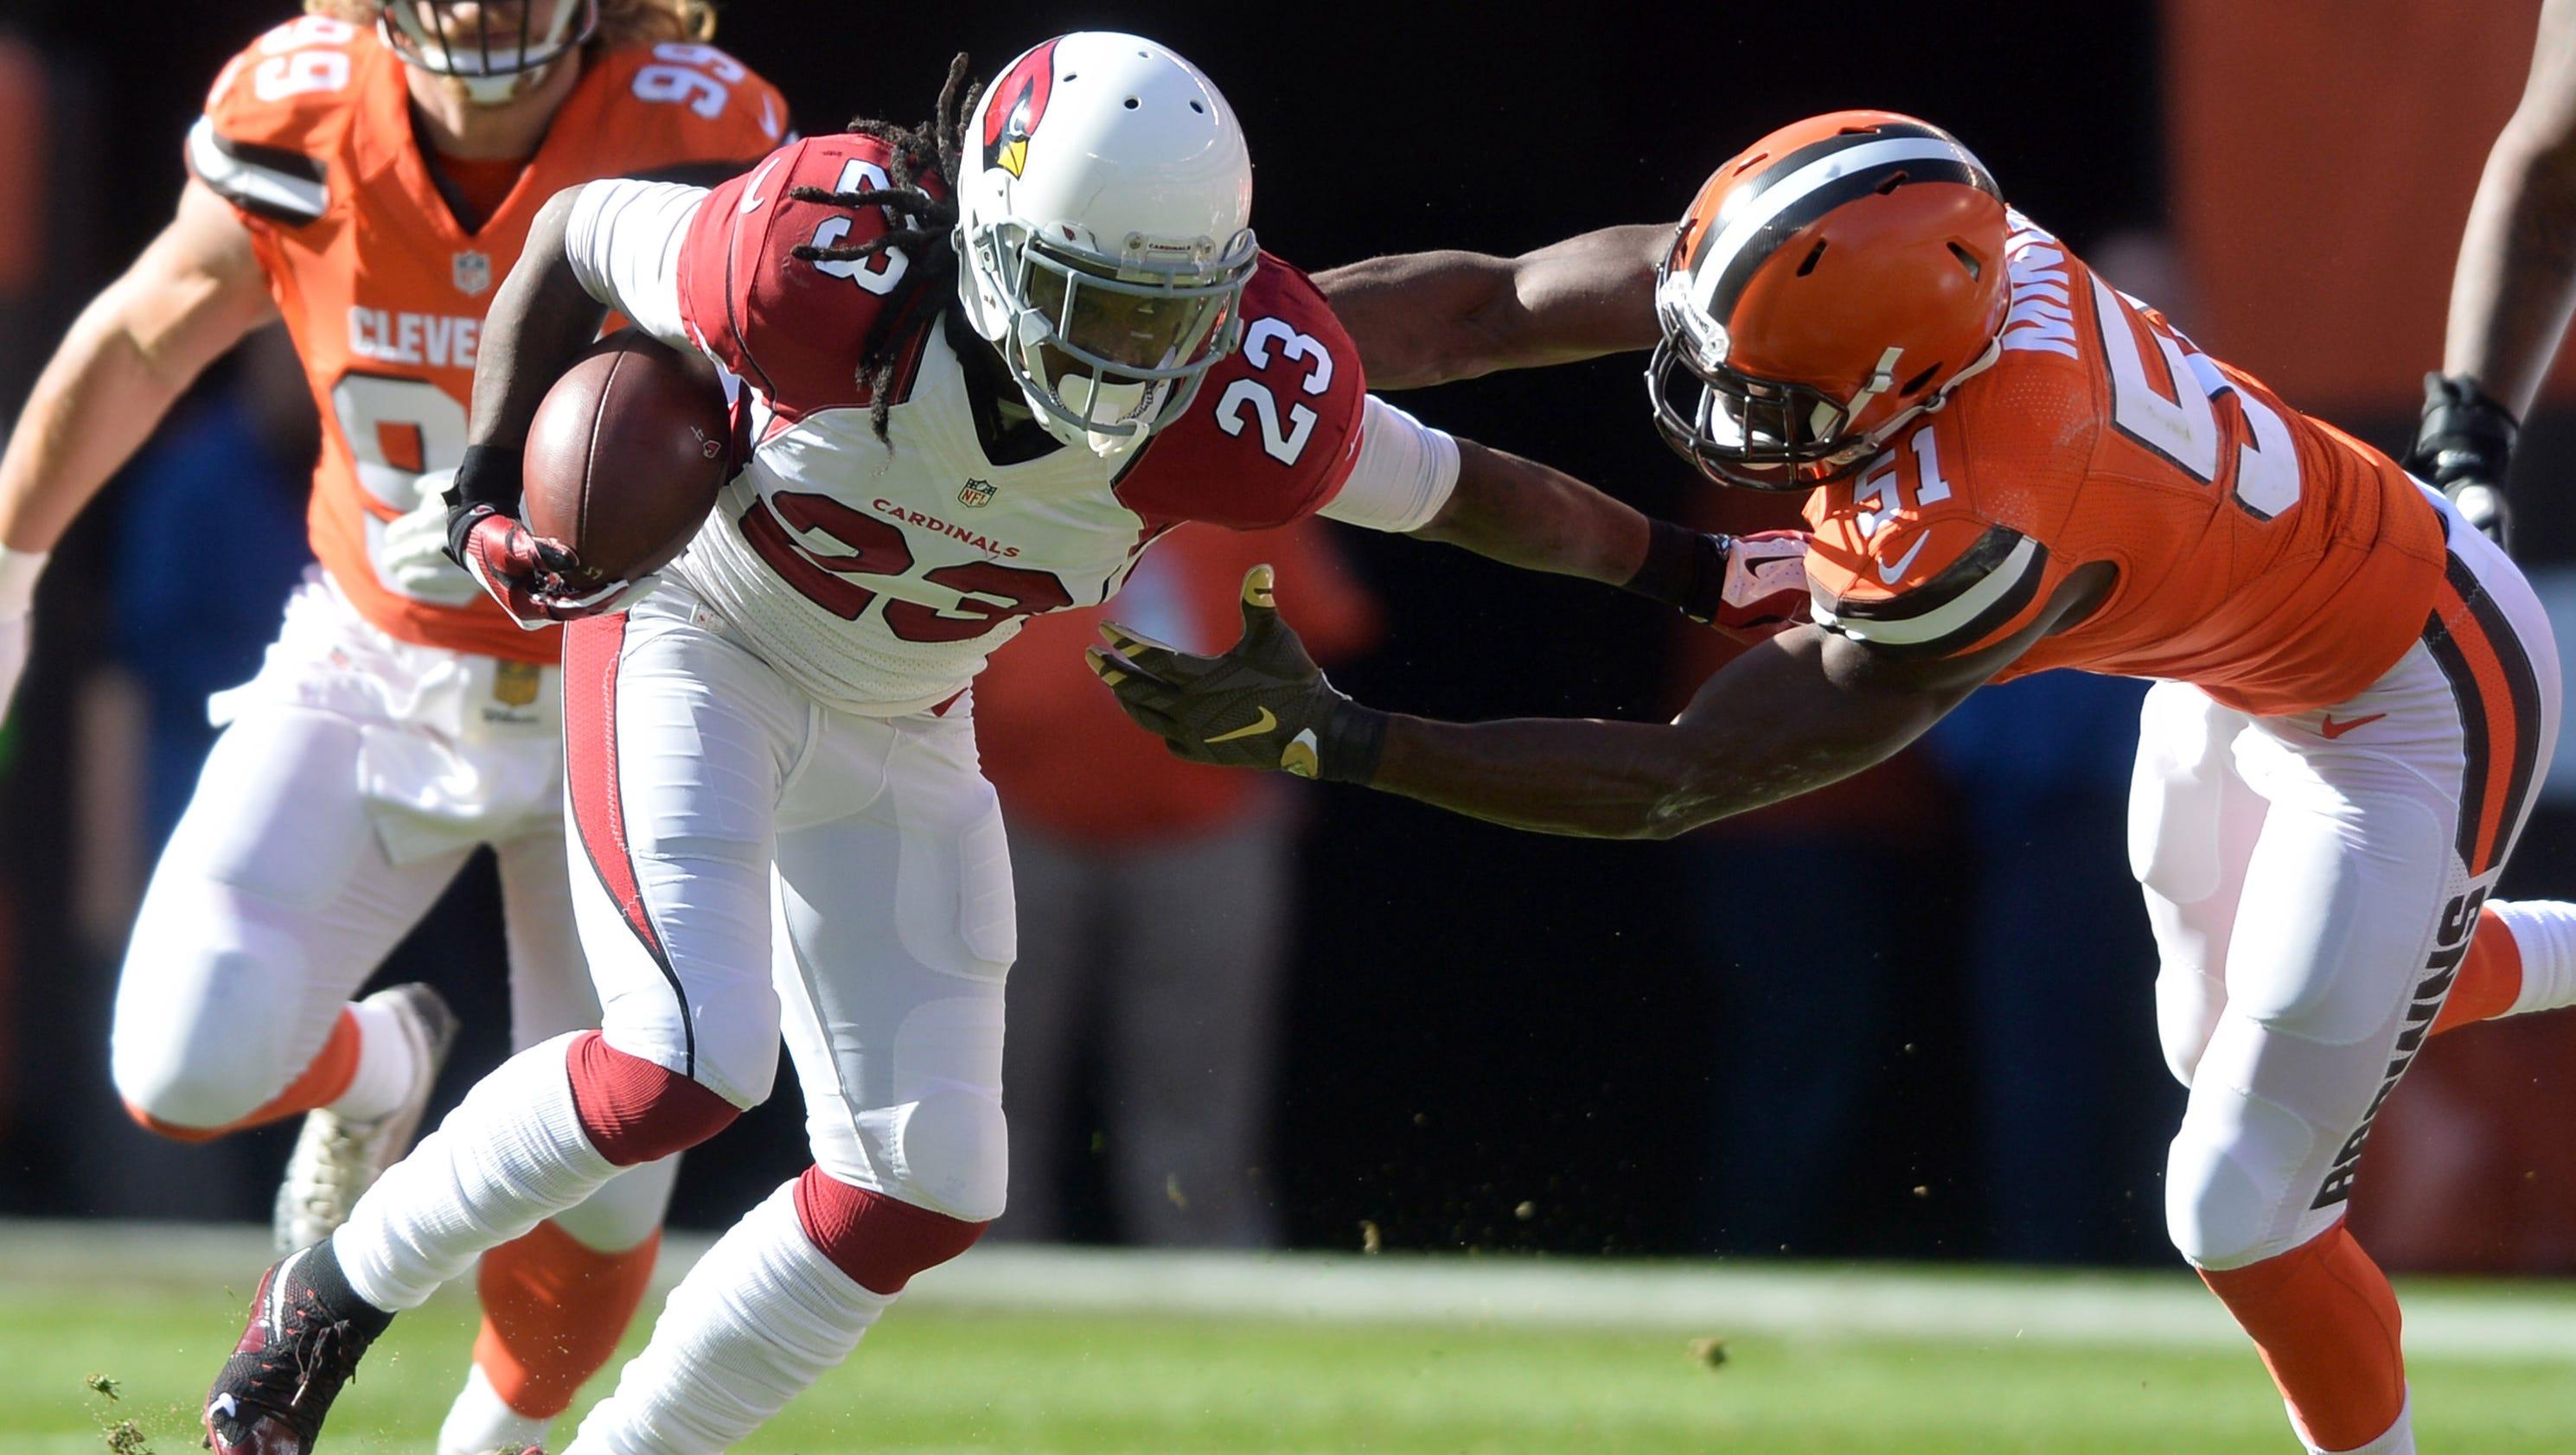 NFL Jerseys Wholesale - Cardinals want Chris Johnson beyond 2015